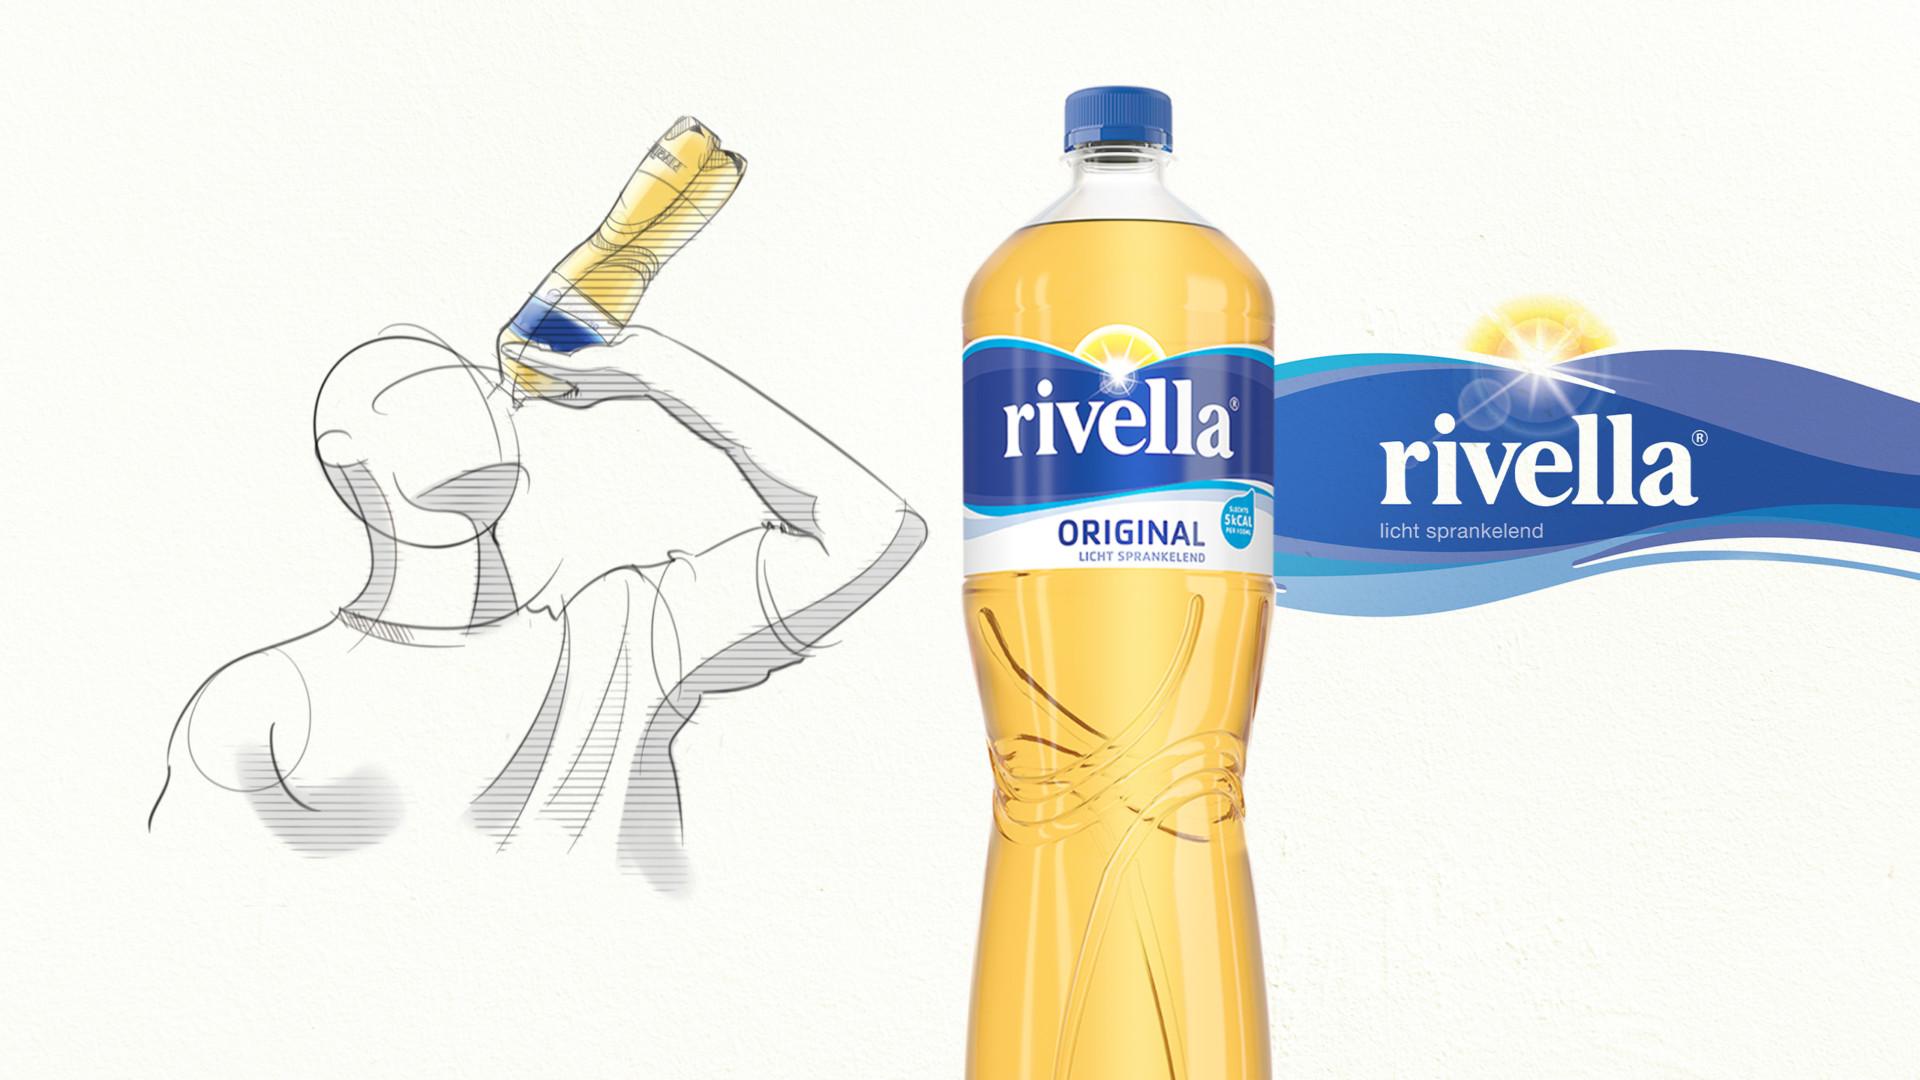 Rivella | Packaging design